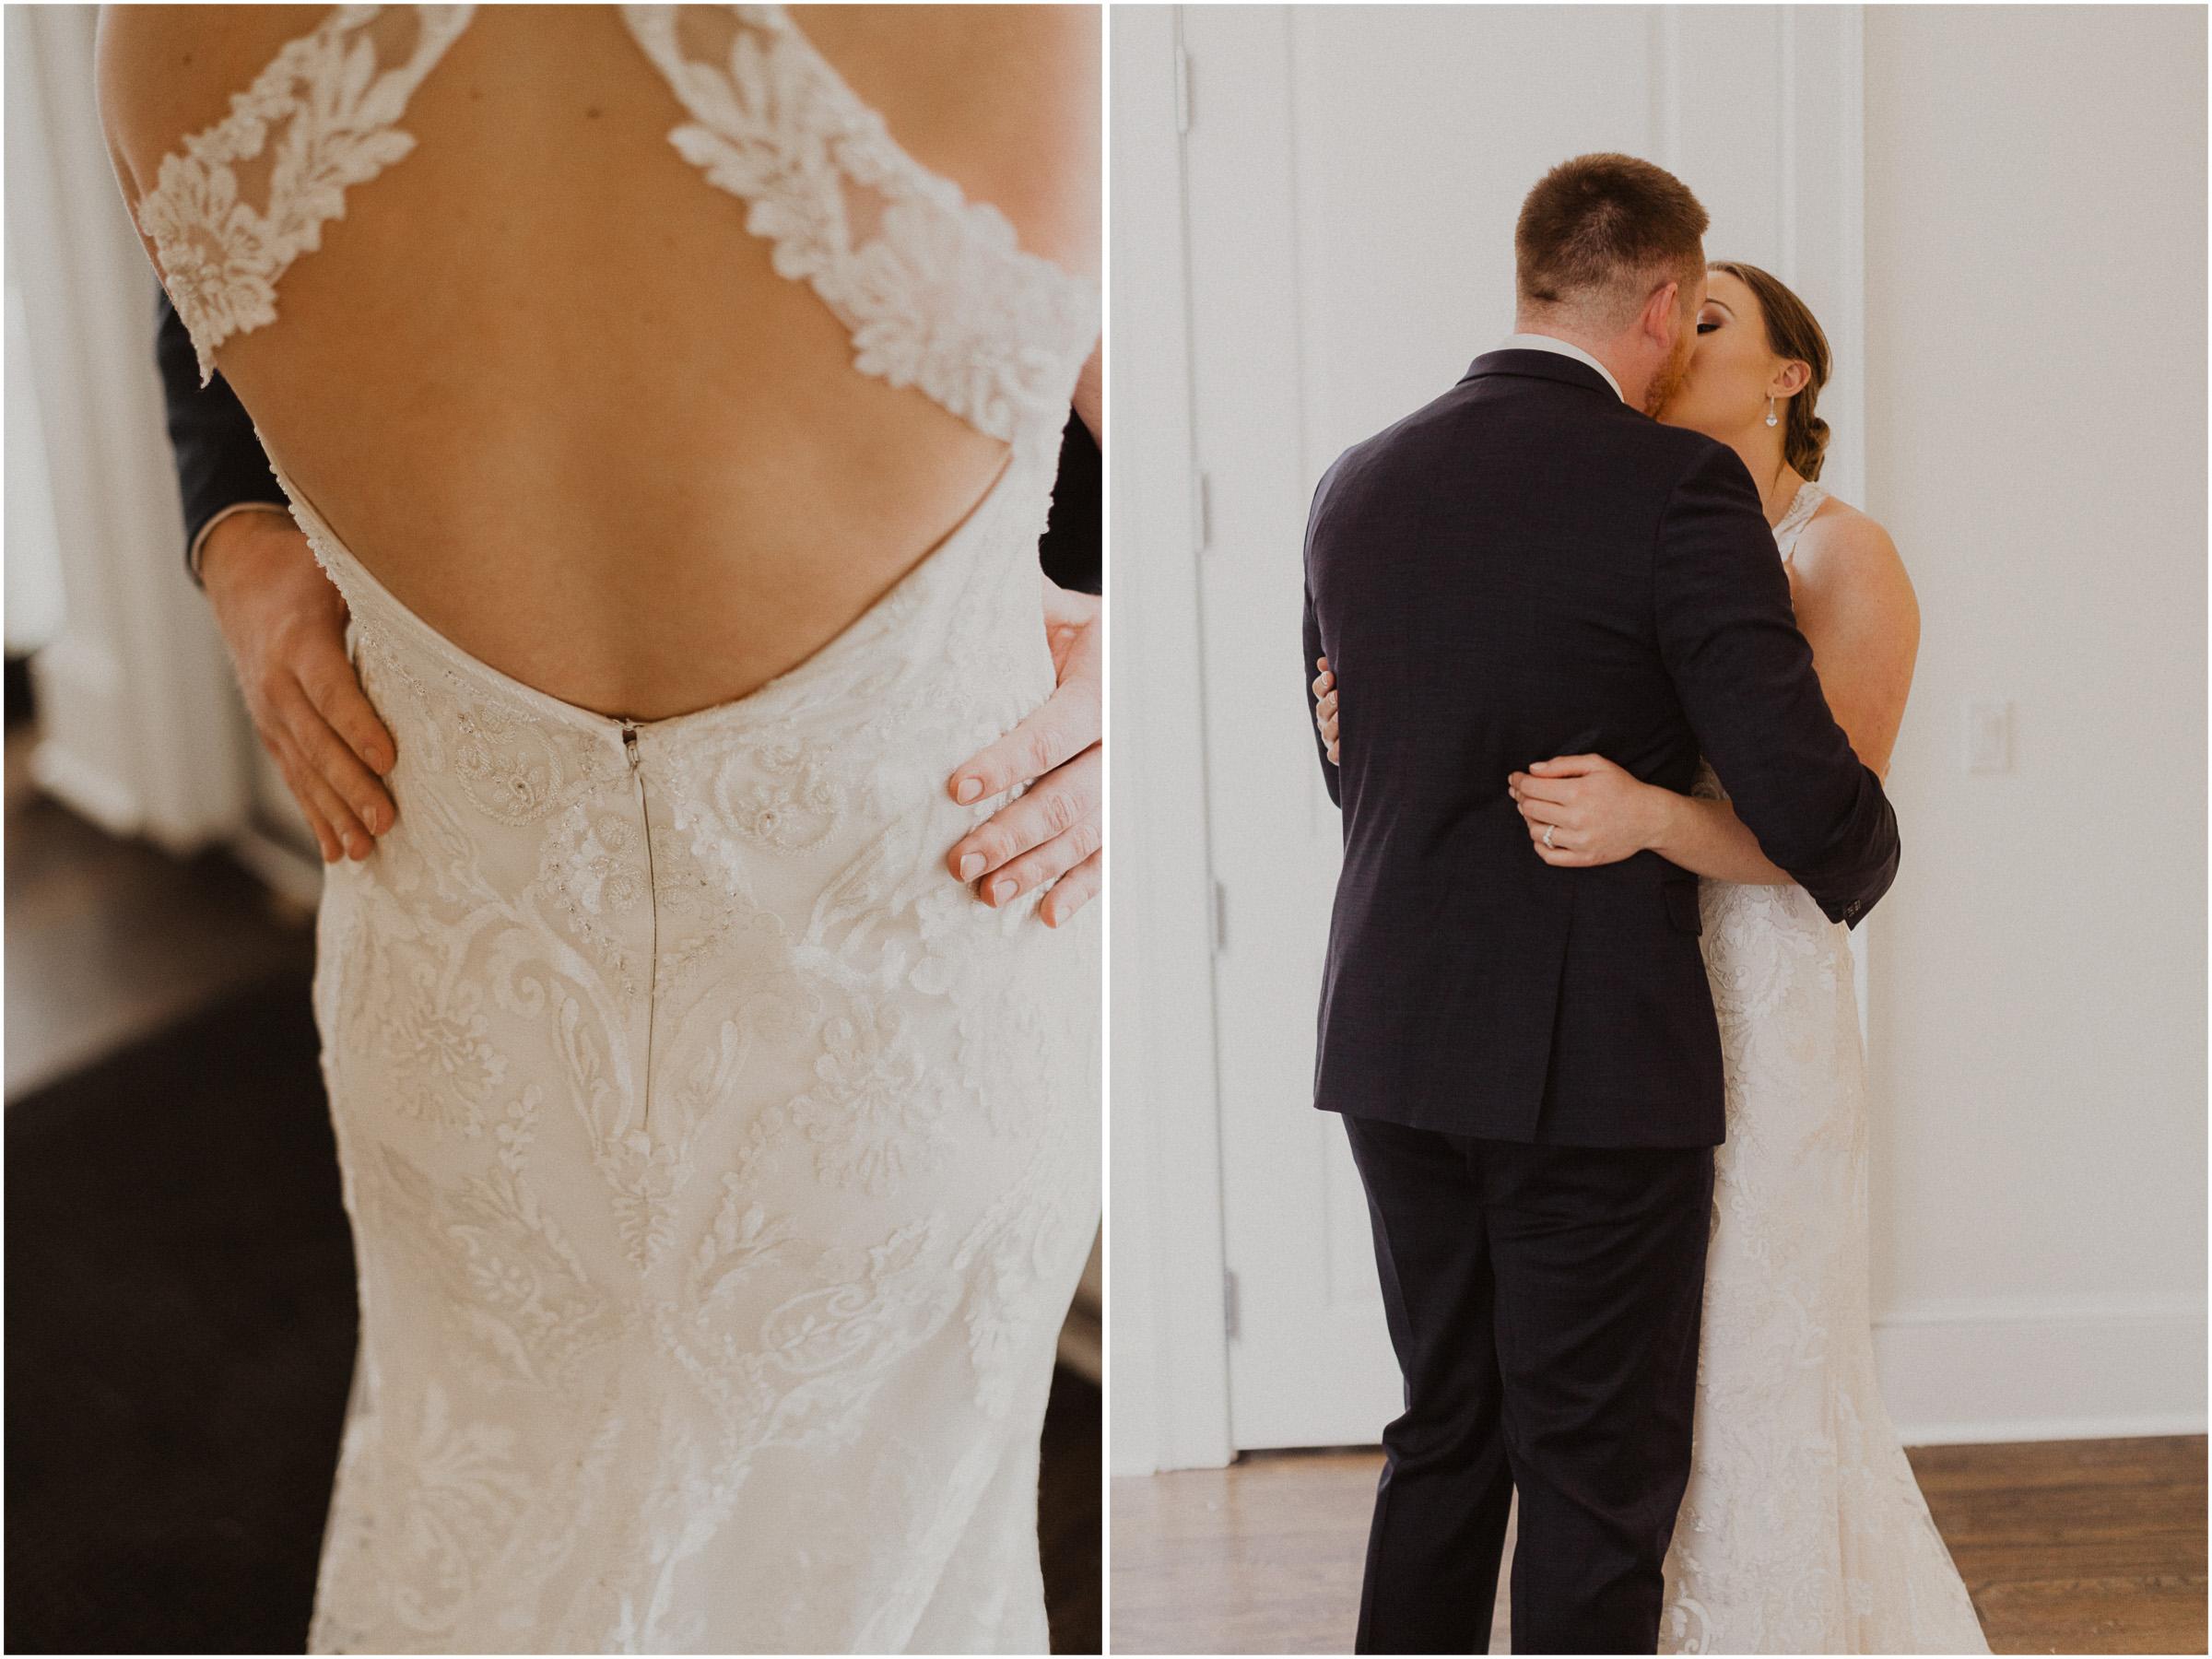 alyssa barletter photography 2016 main kansas city wedding rainy day photographer grace and justin magott-18.jpg